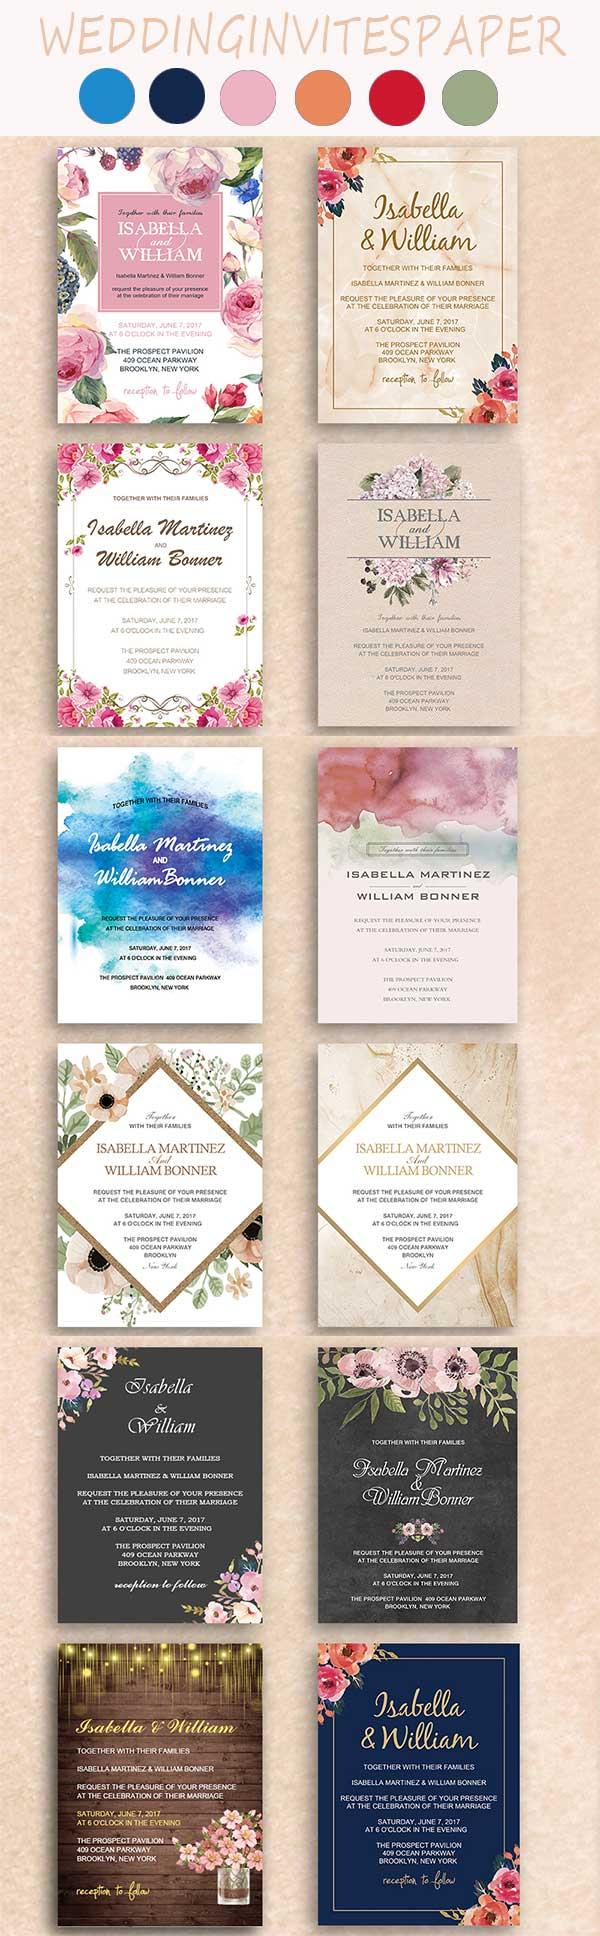 35 Unique Inexpensive Wedding Invitations From WIP - Wedding Invites ...